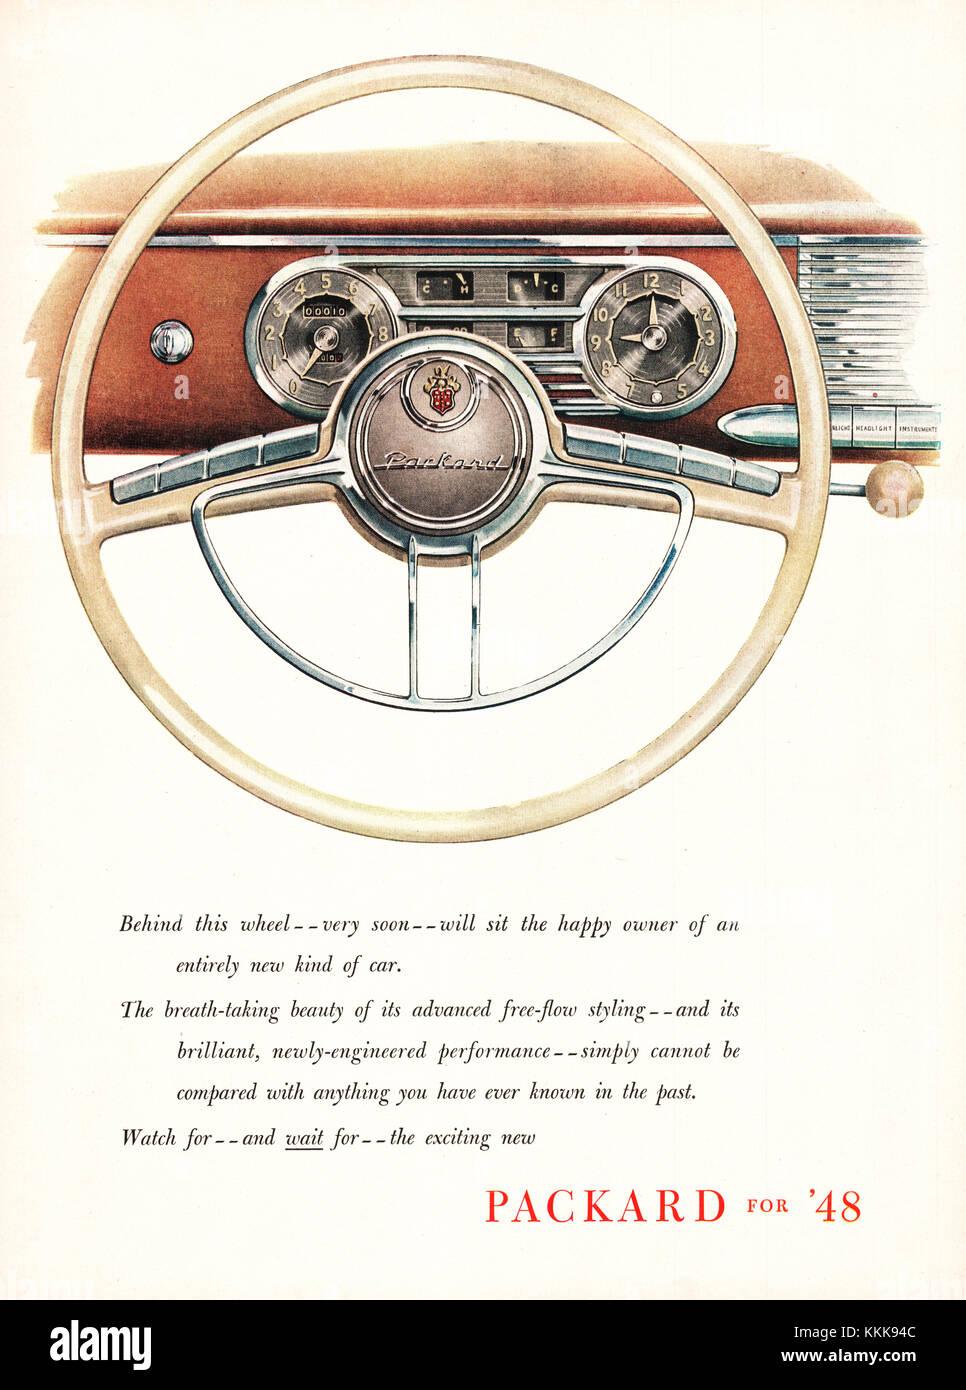 1947 U.S. Magazine Dodge Cars Advert - Stock Image